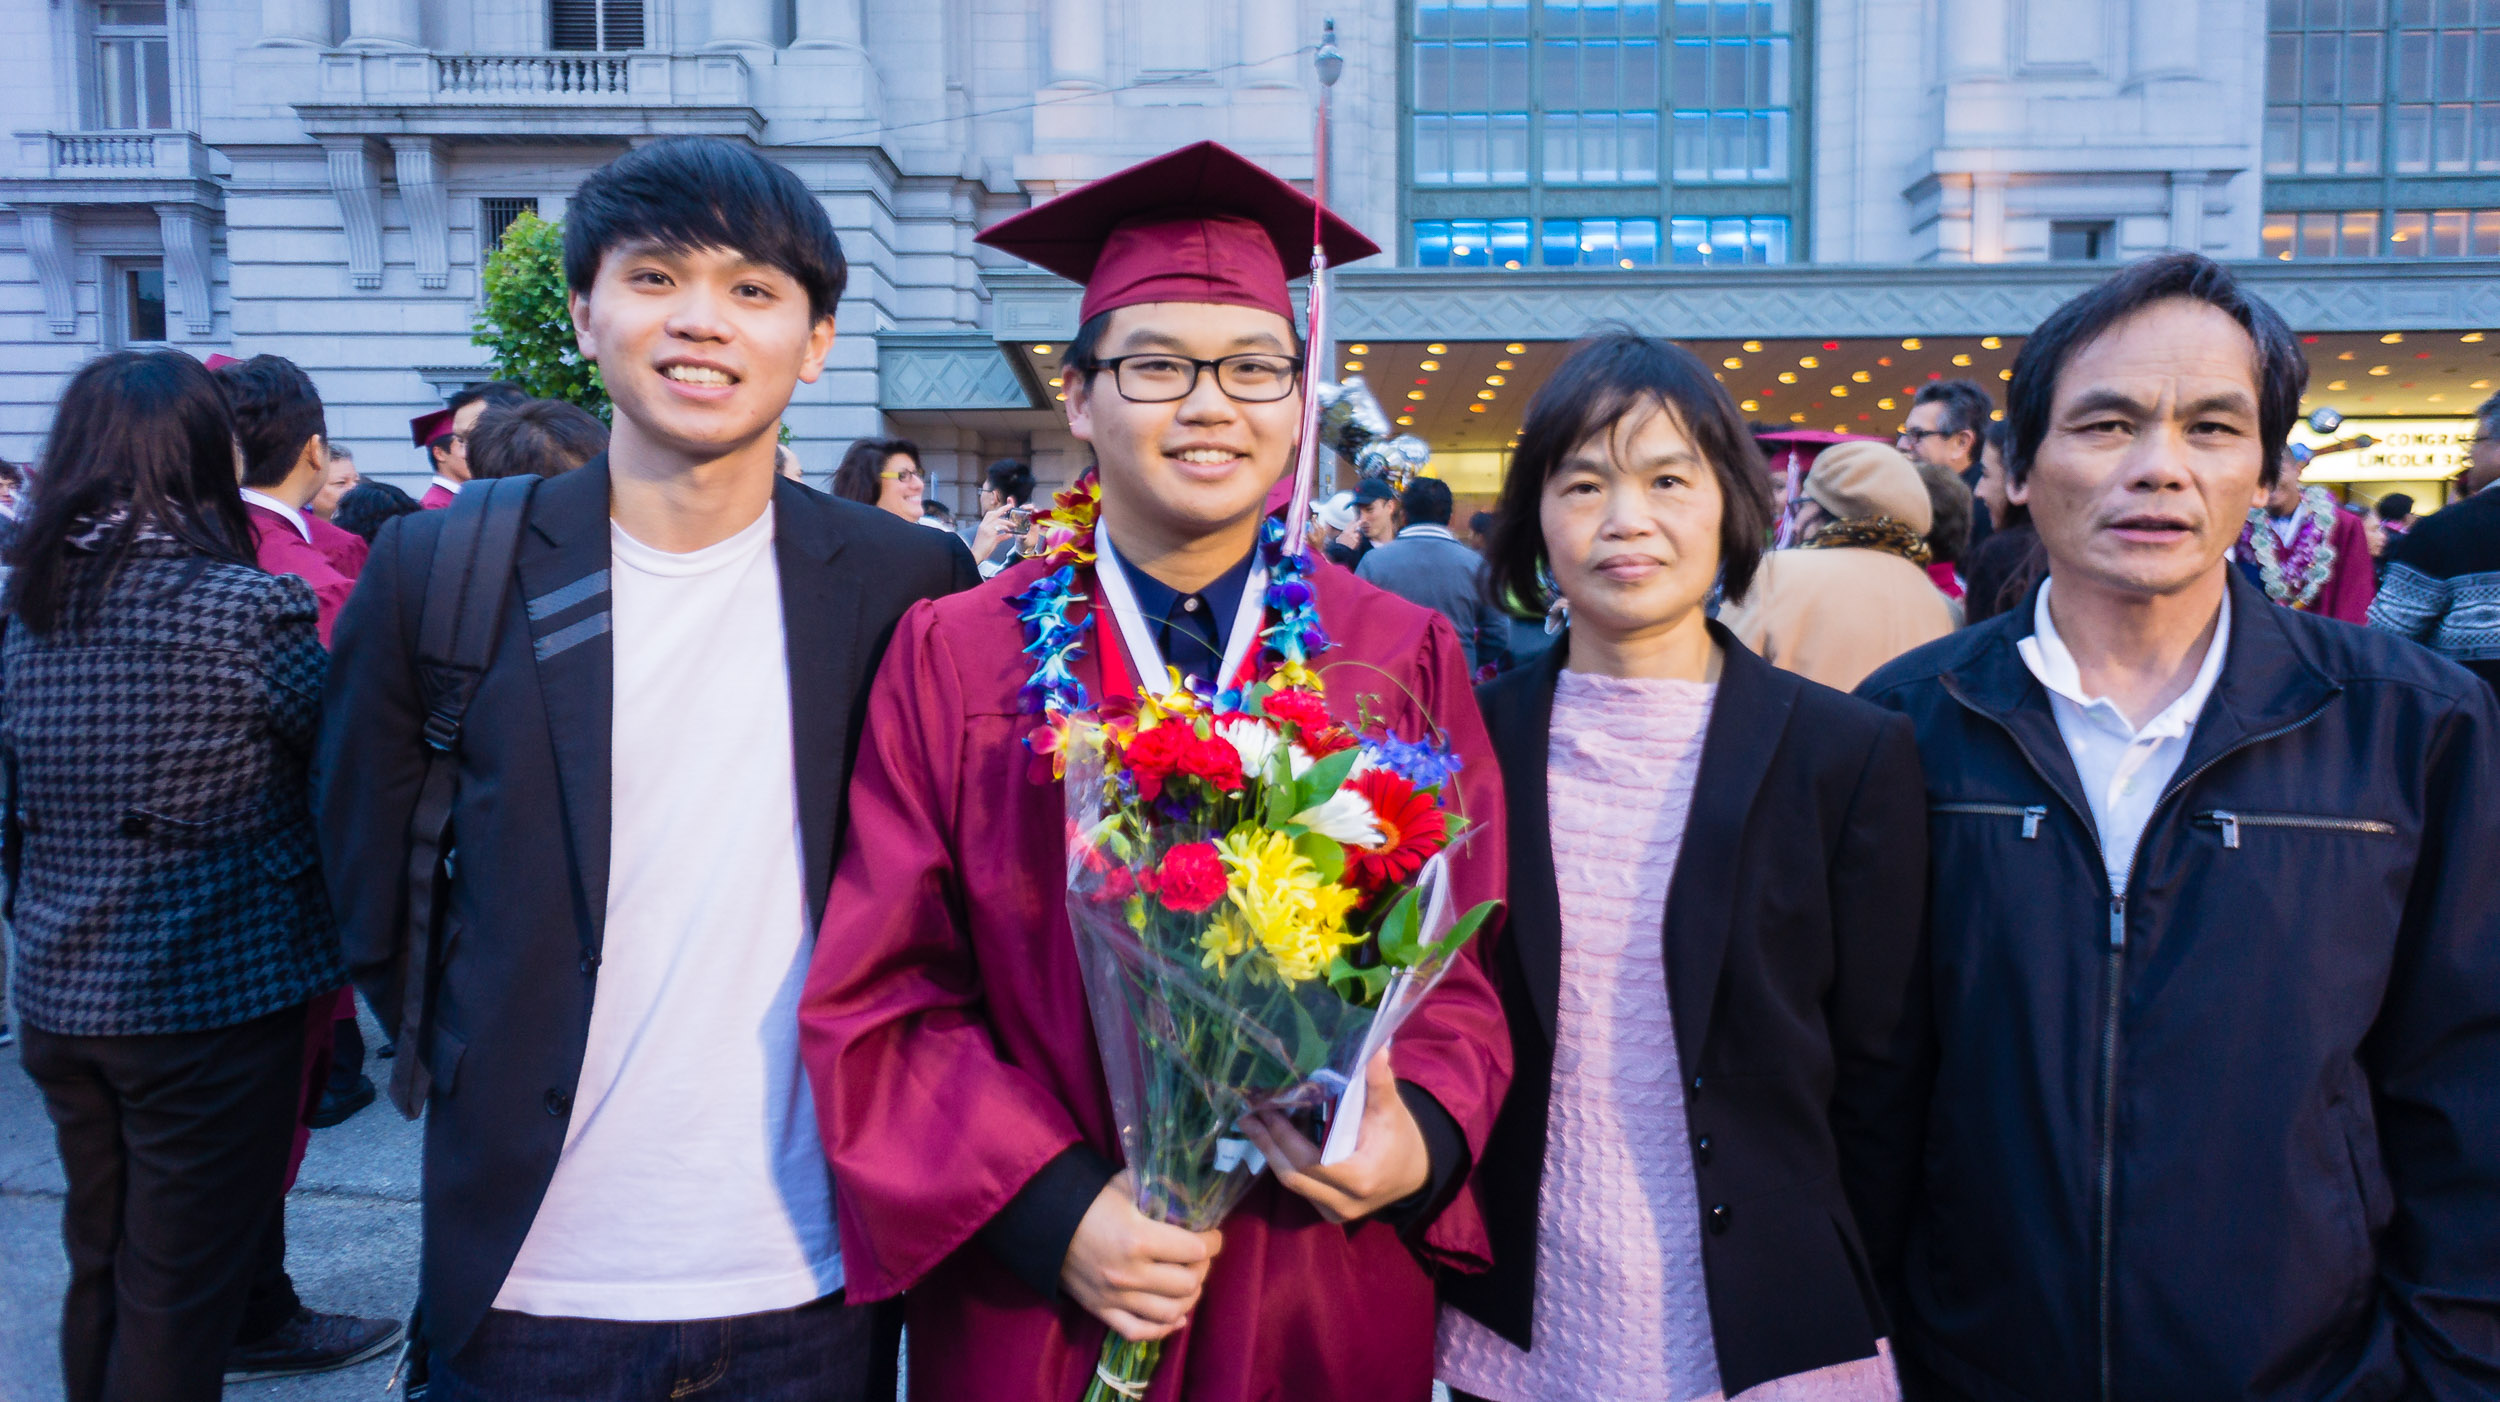 brother_high_school_graduation.jpg